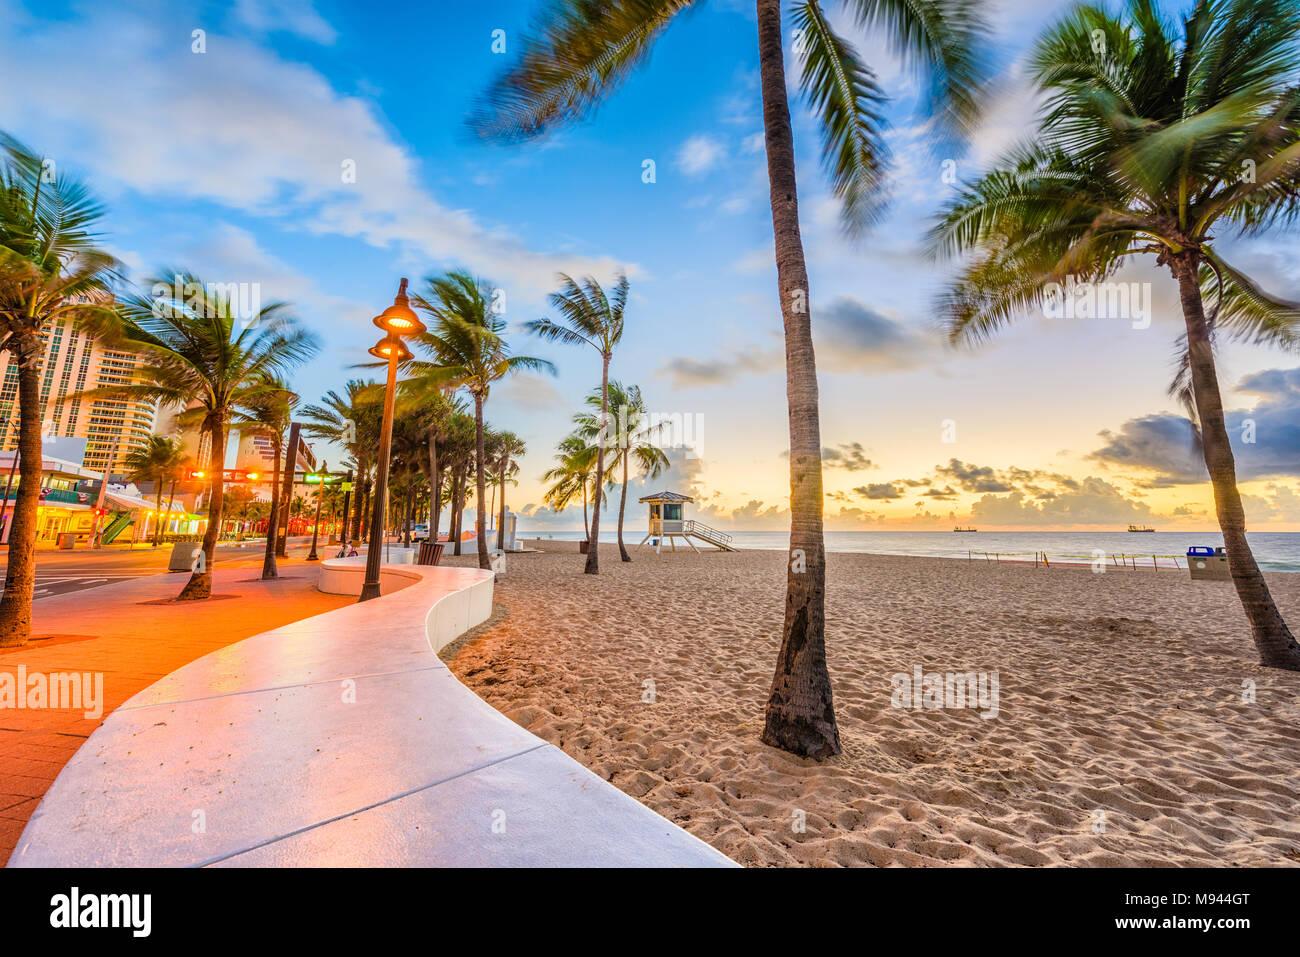 Ft. Lauderdale Beach, Florida, USA im Las Olas Blvd. Stockbild